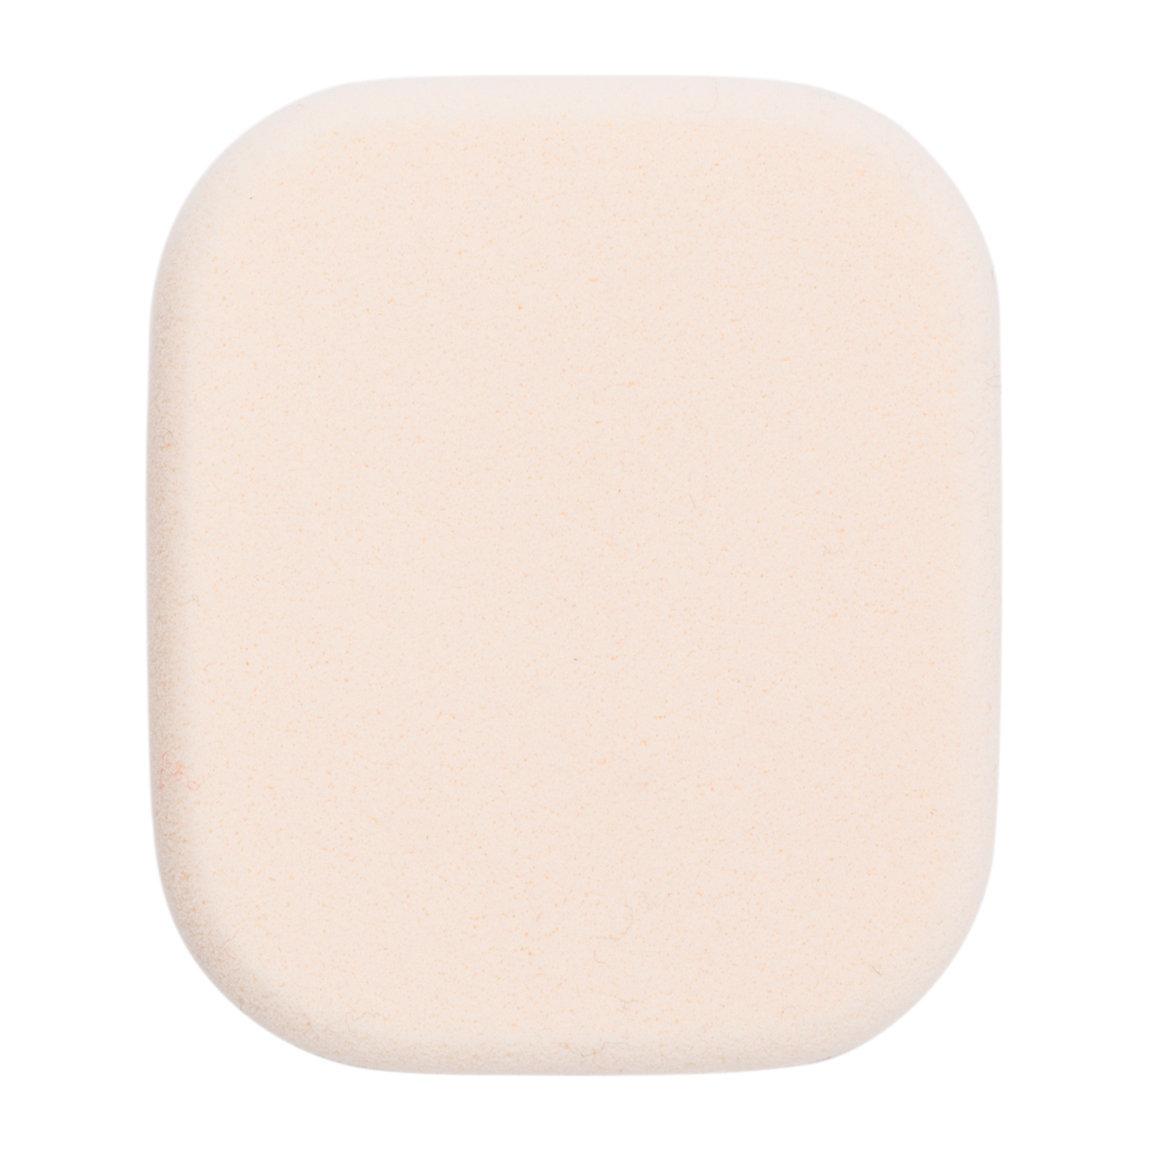 Koh Gen Do Makeup Sponge alternative view 1 - product swatch.